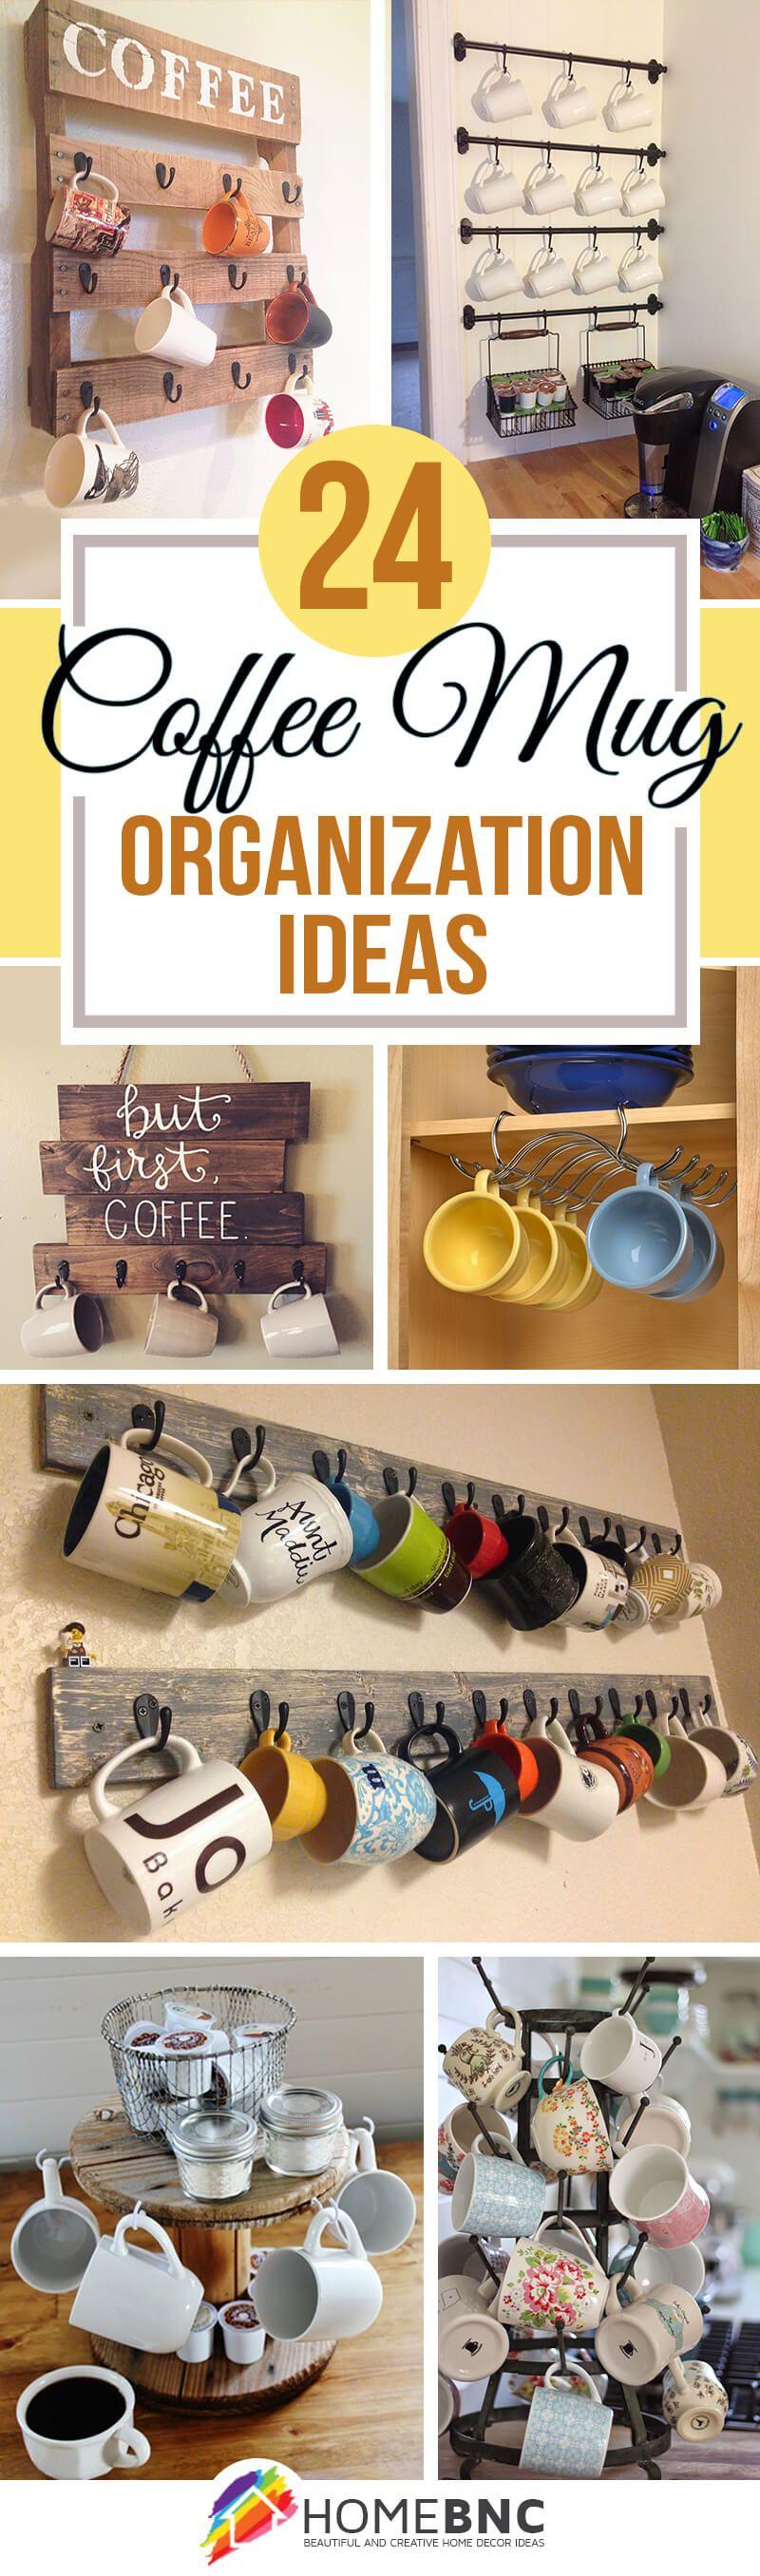 Fun And Creative Coffee Mug Organization Ideas Coffee Bar - Best coffee mug organization ideas